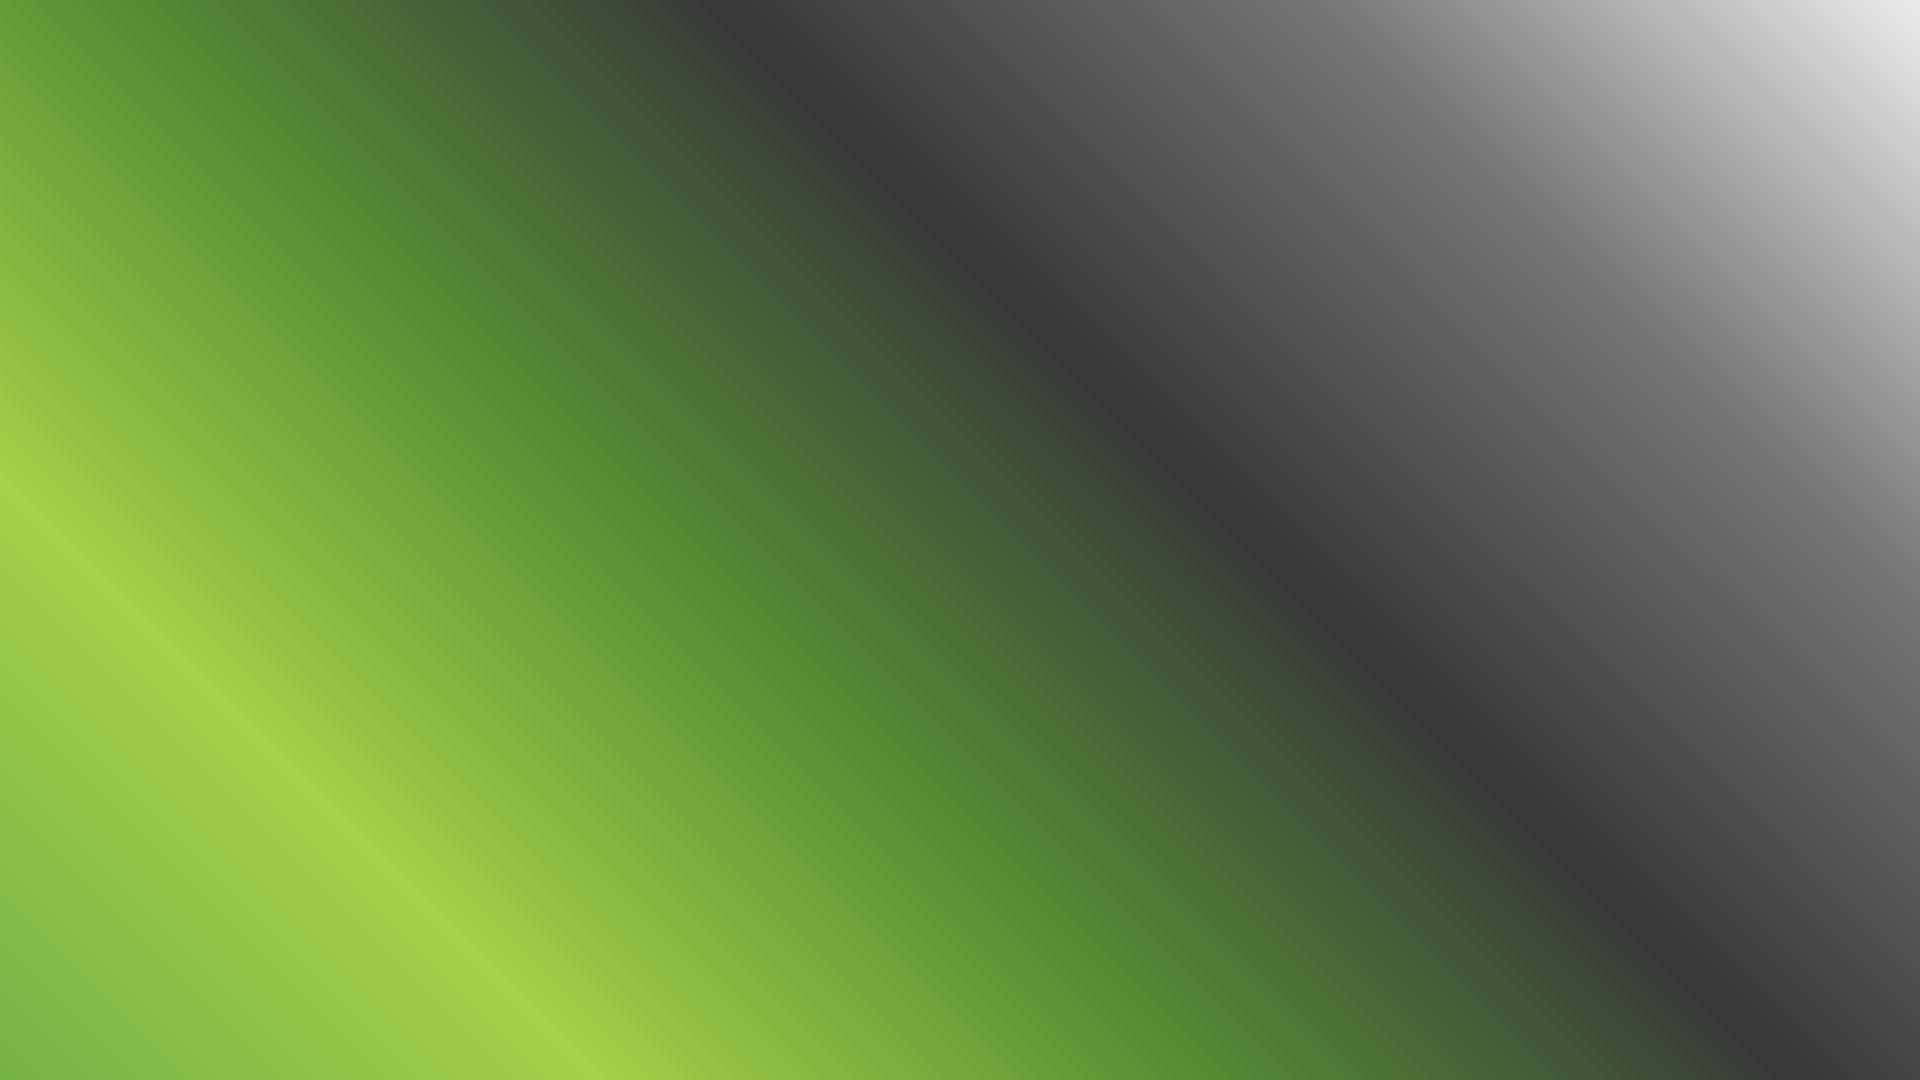 Hulu Hex Colors CSS Gradient Brand Gradients 1920x1080